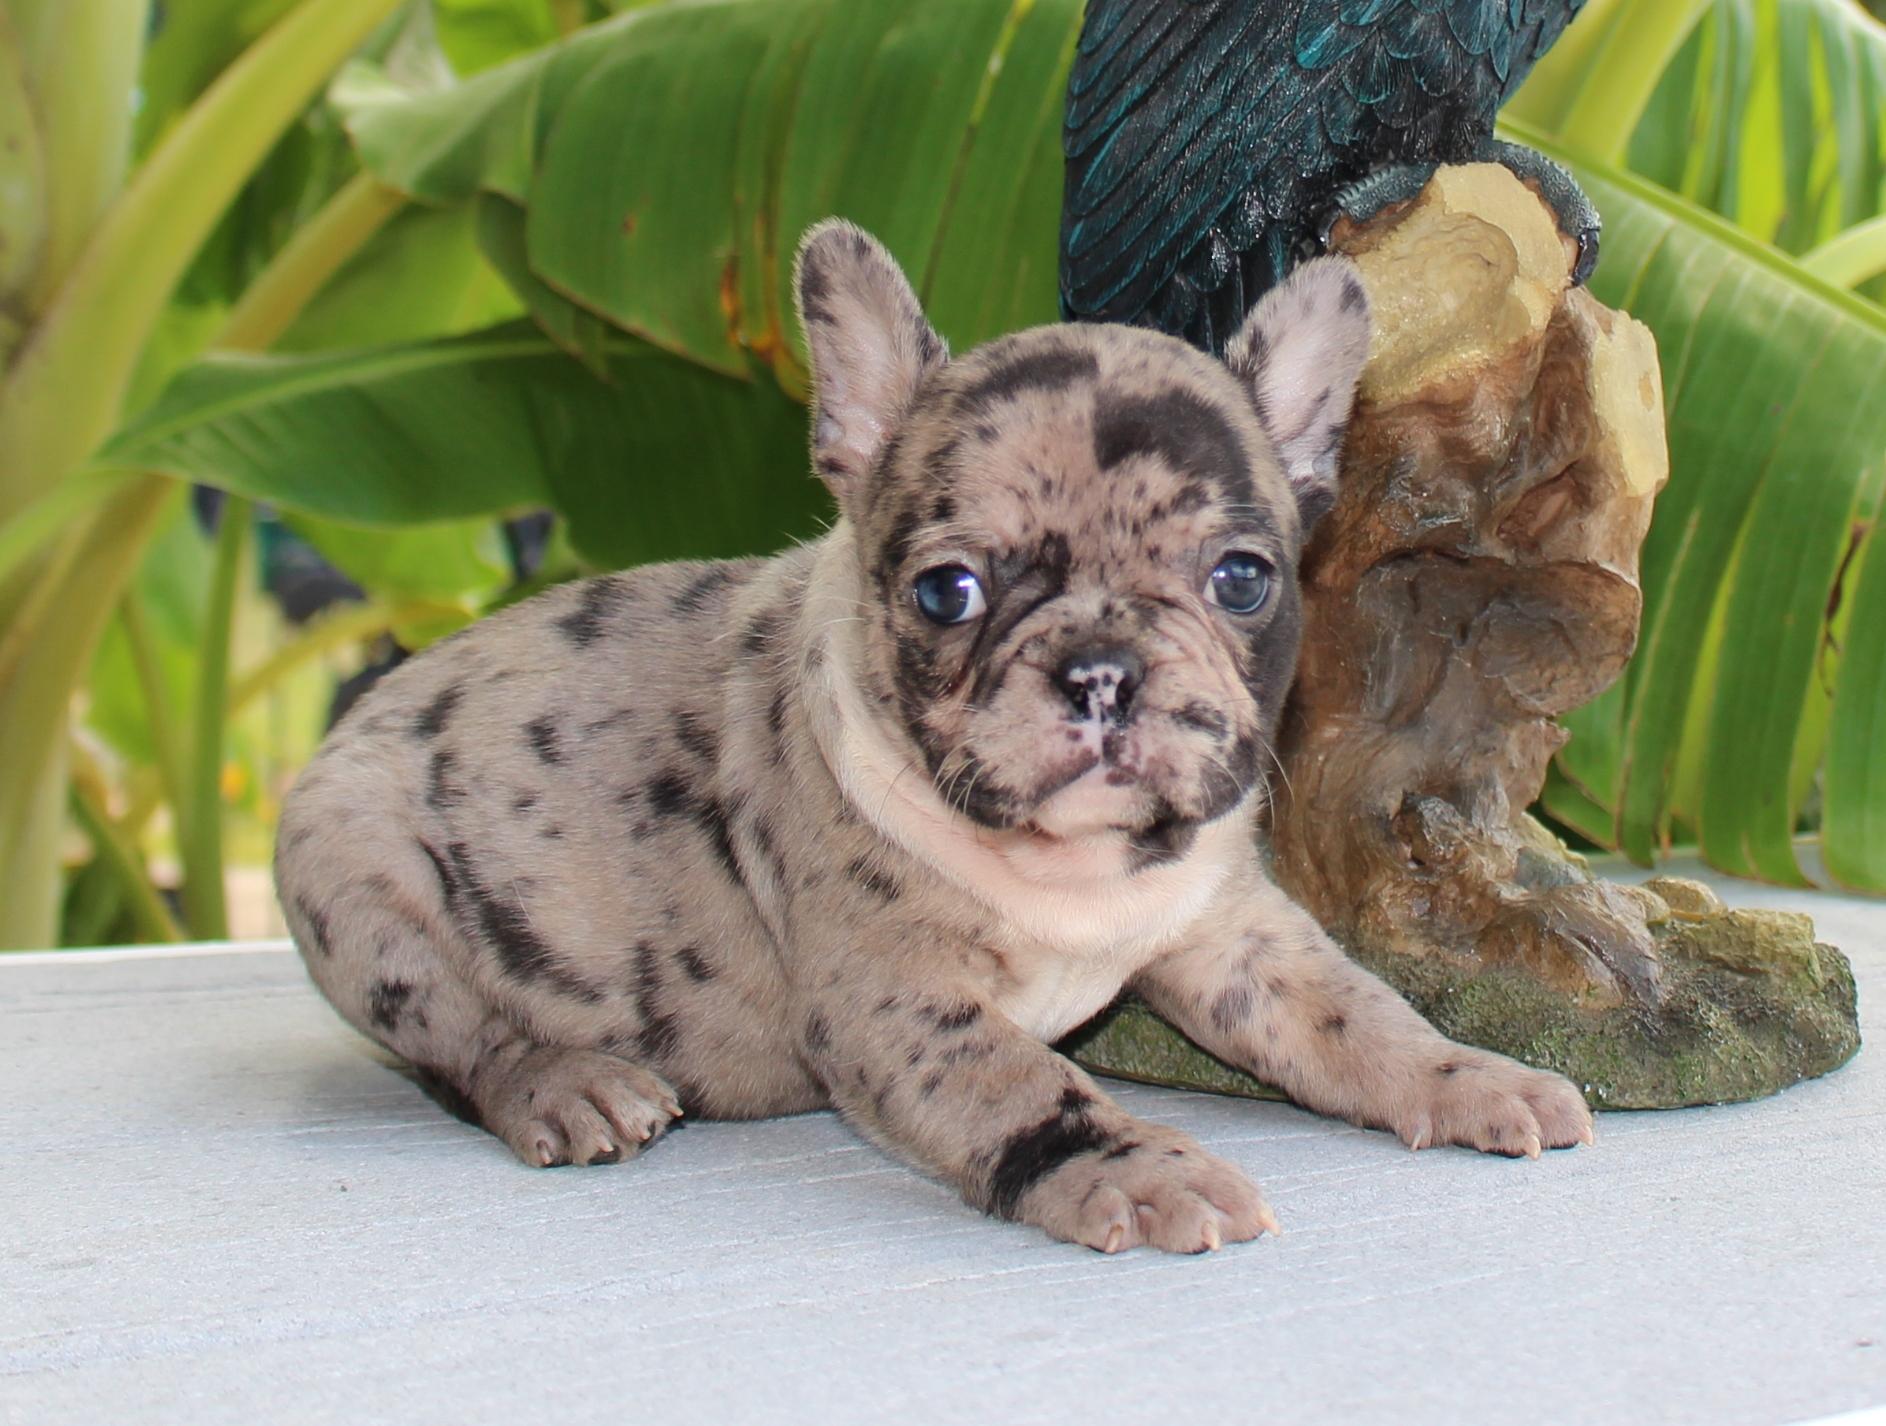 #FrenchBulldogPuppies #MerleFrenchBulldogPuppies